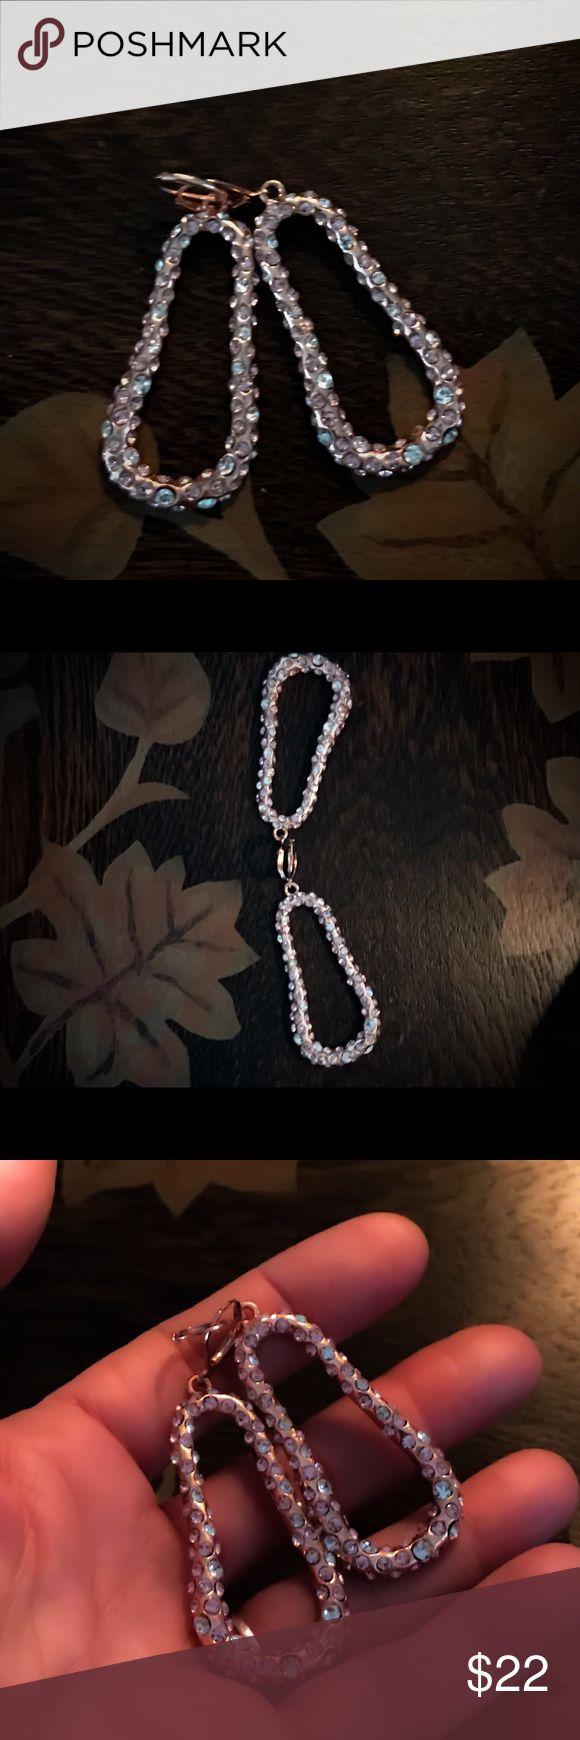 ROSEGOLD CRYSTAL CRUSTED SUSAN GRAVER EARRINGS NWT 🌸🌸🌸🌸🌸 Susan Graver Jewelry Earrings